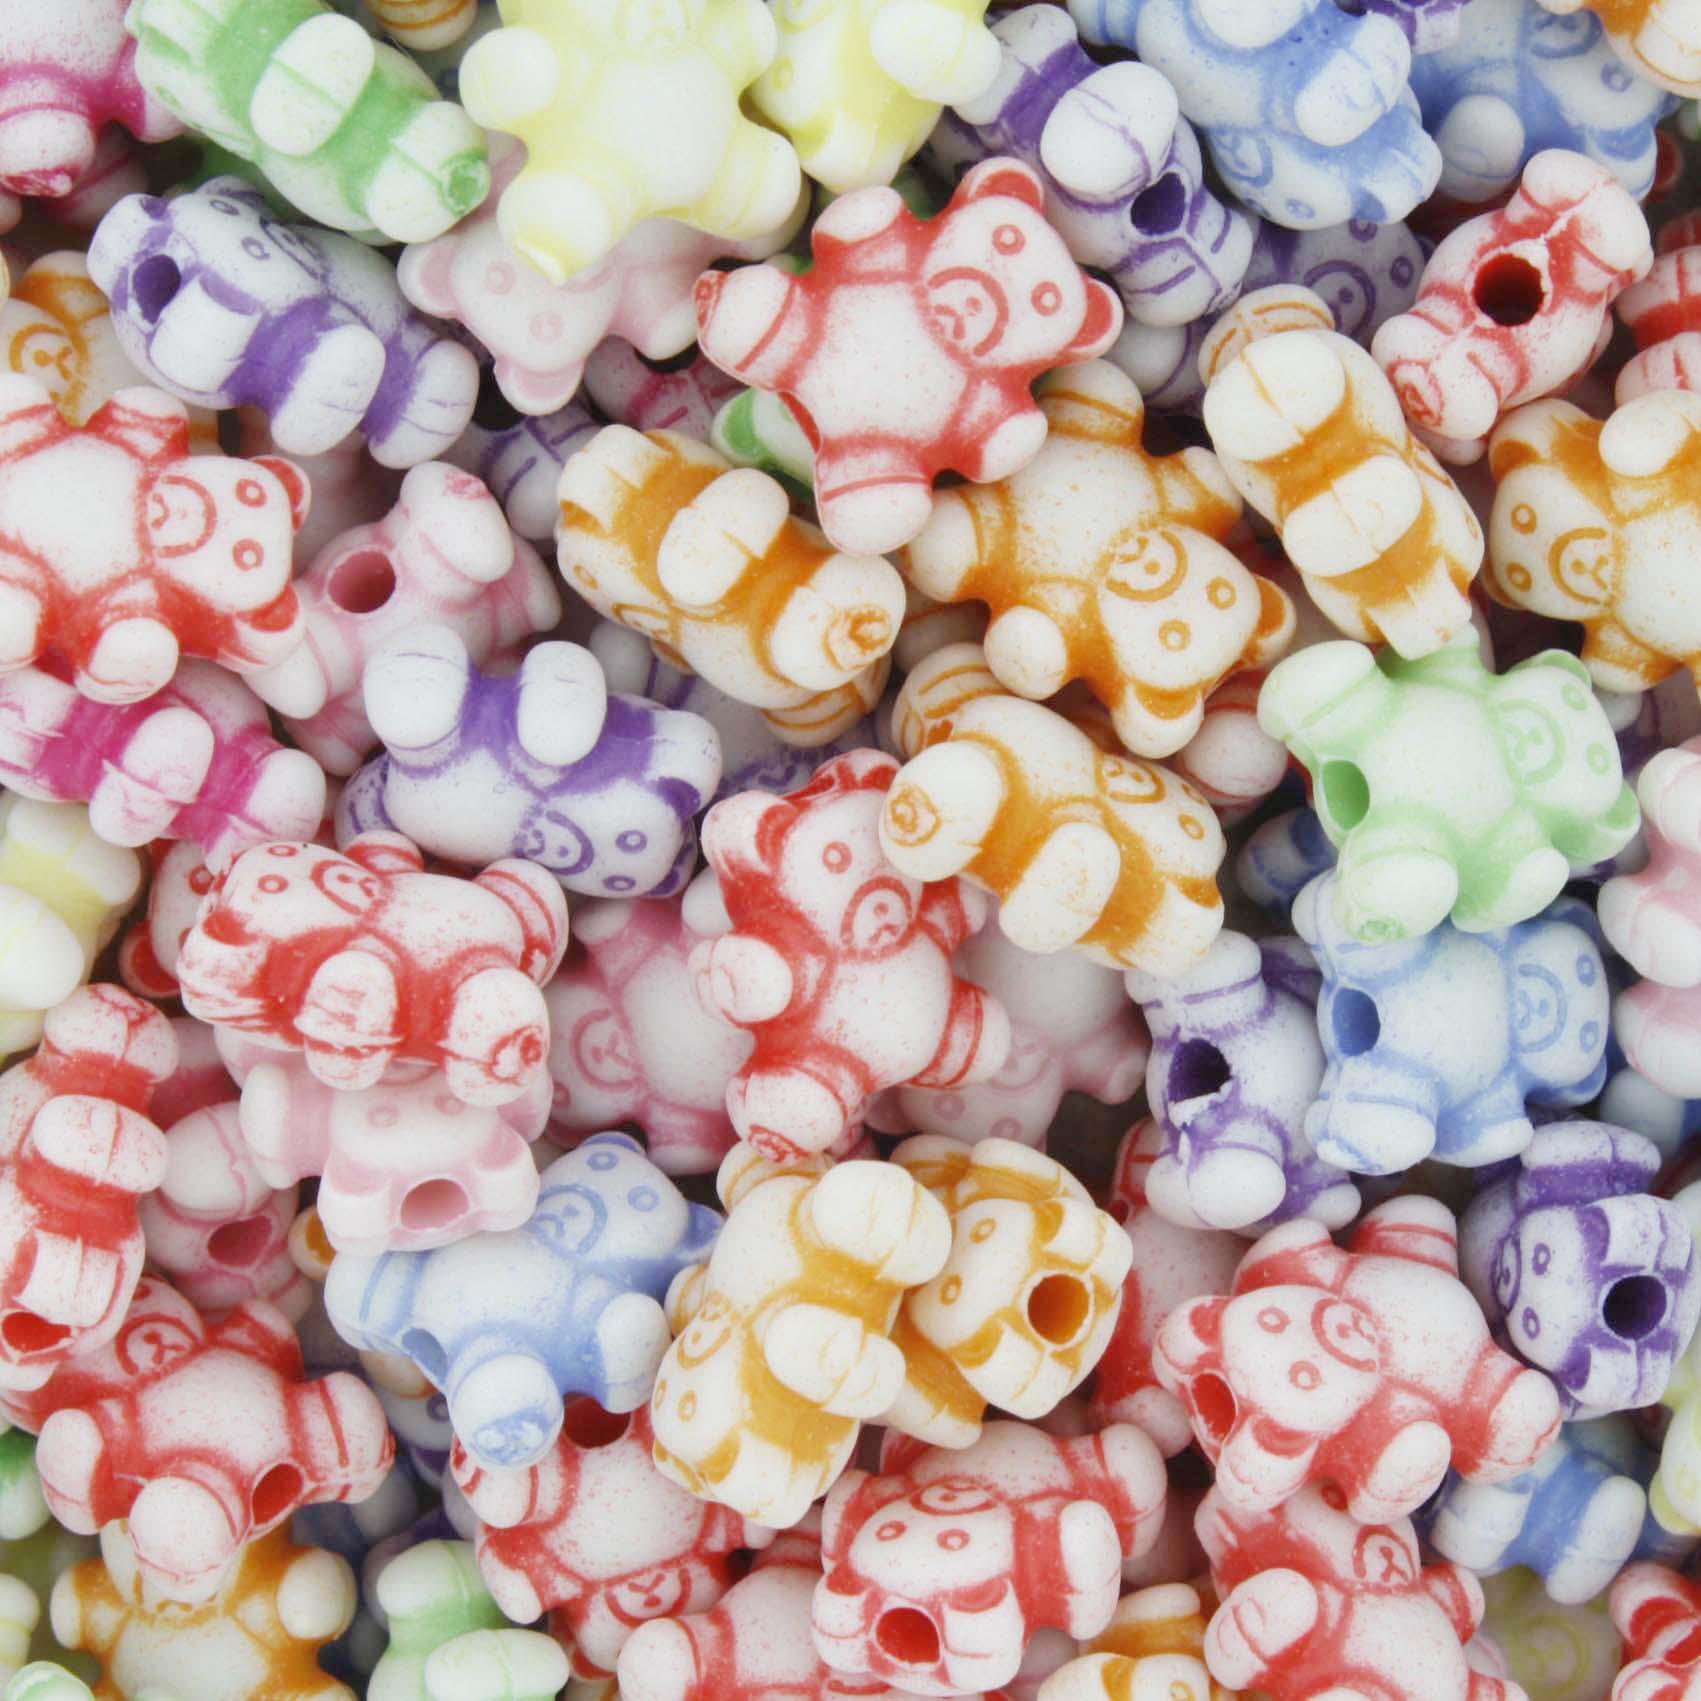 Miçanga Colorida / Infantil - Ursinhos  - Stéphanie Bijoux® - Peças para Bijuterias e Artesanato